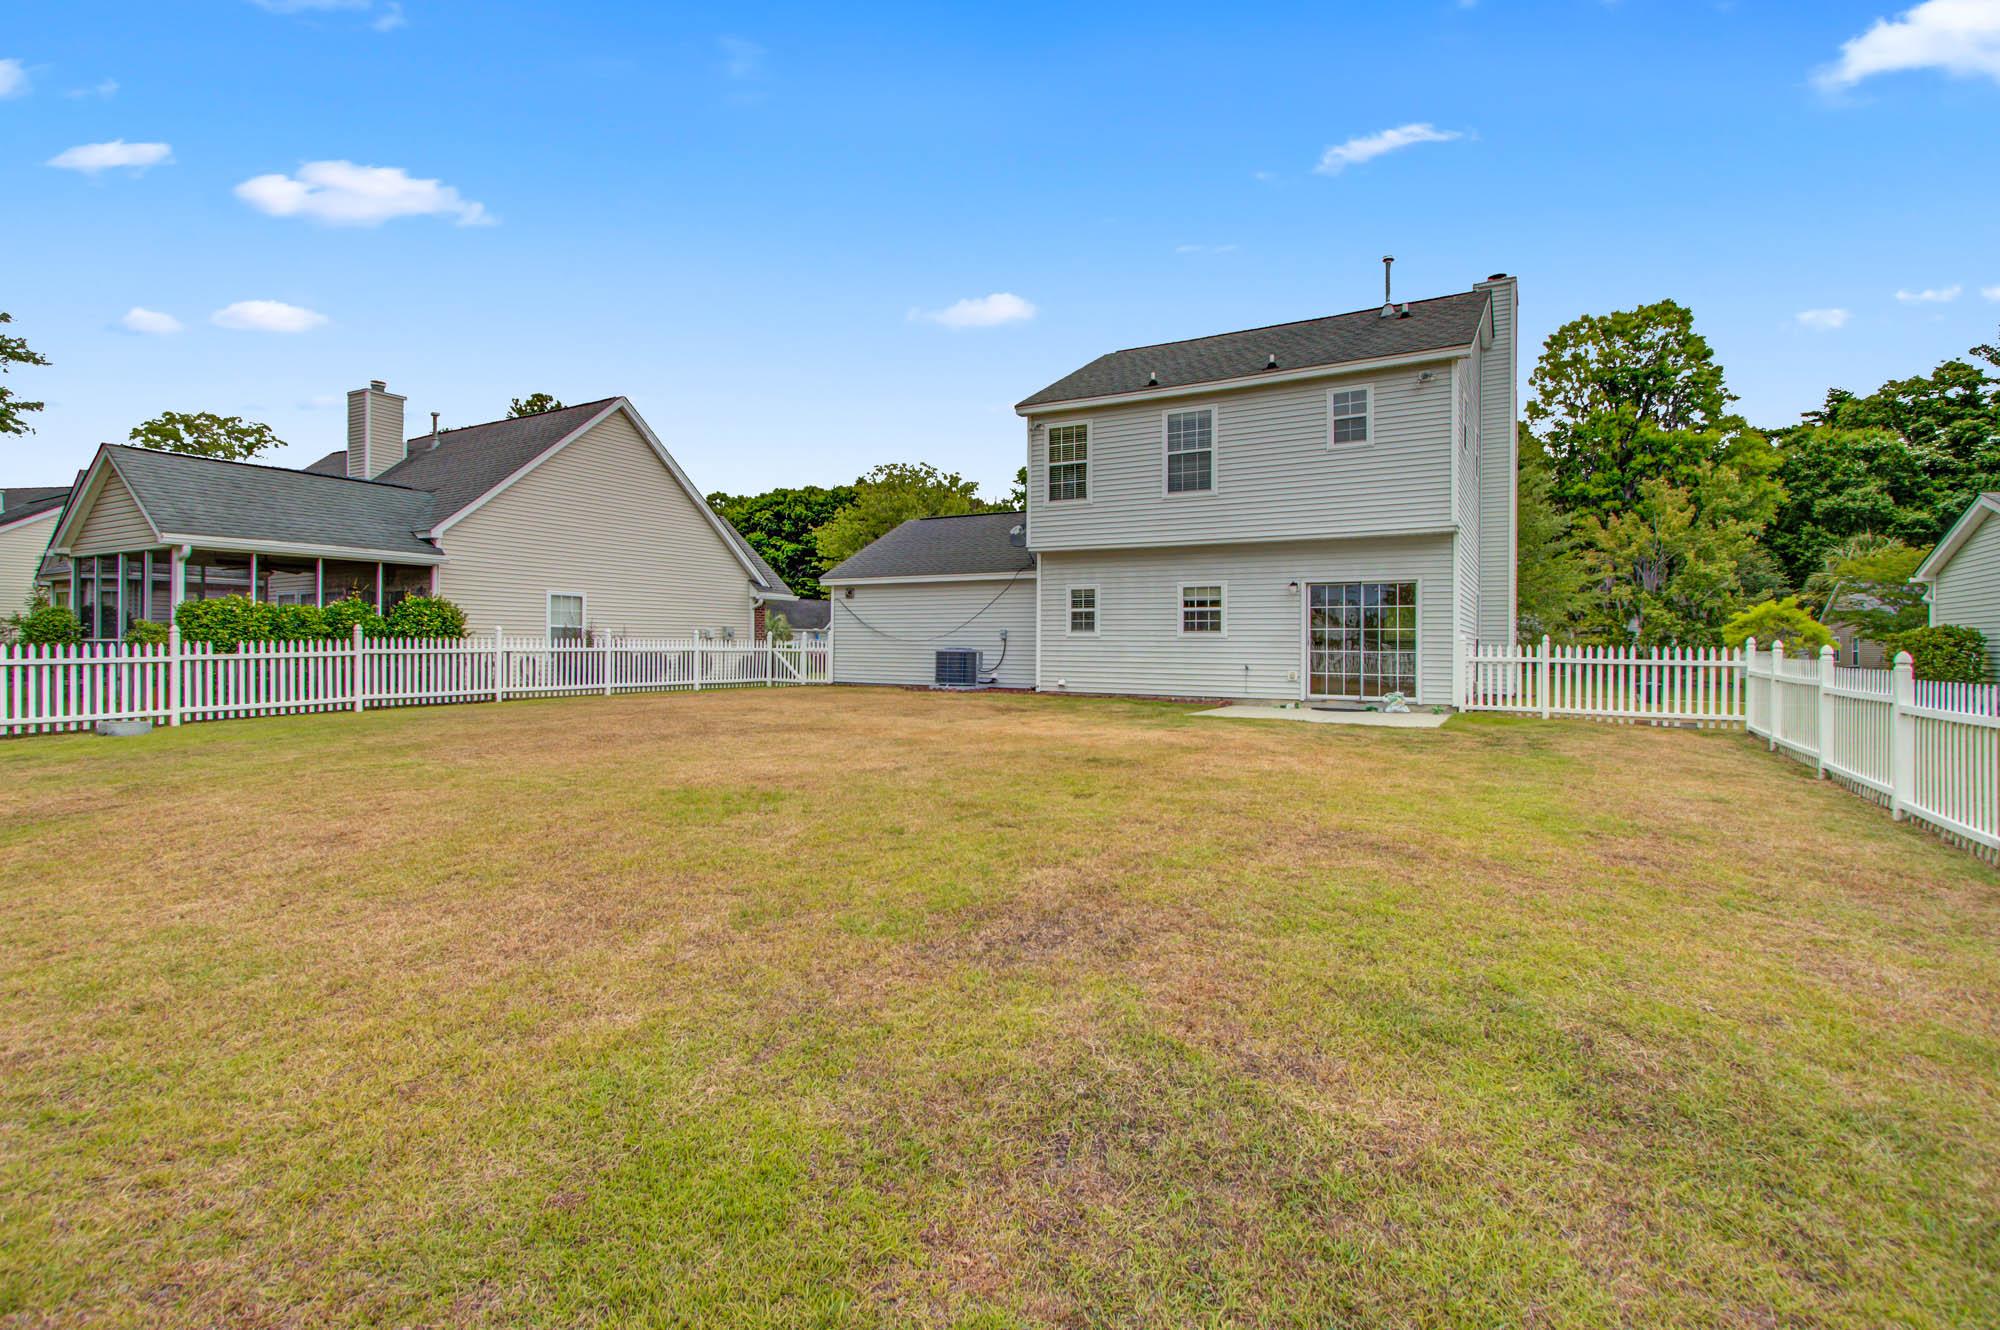 844 Bent Hickory Rd Charleston SC 29414-9076 - Photo 28